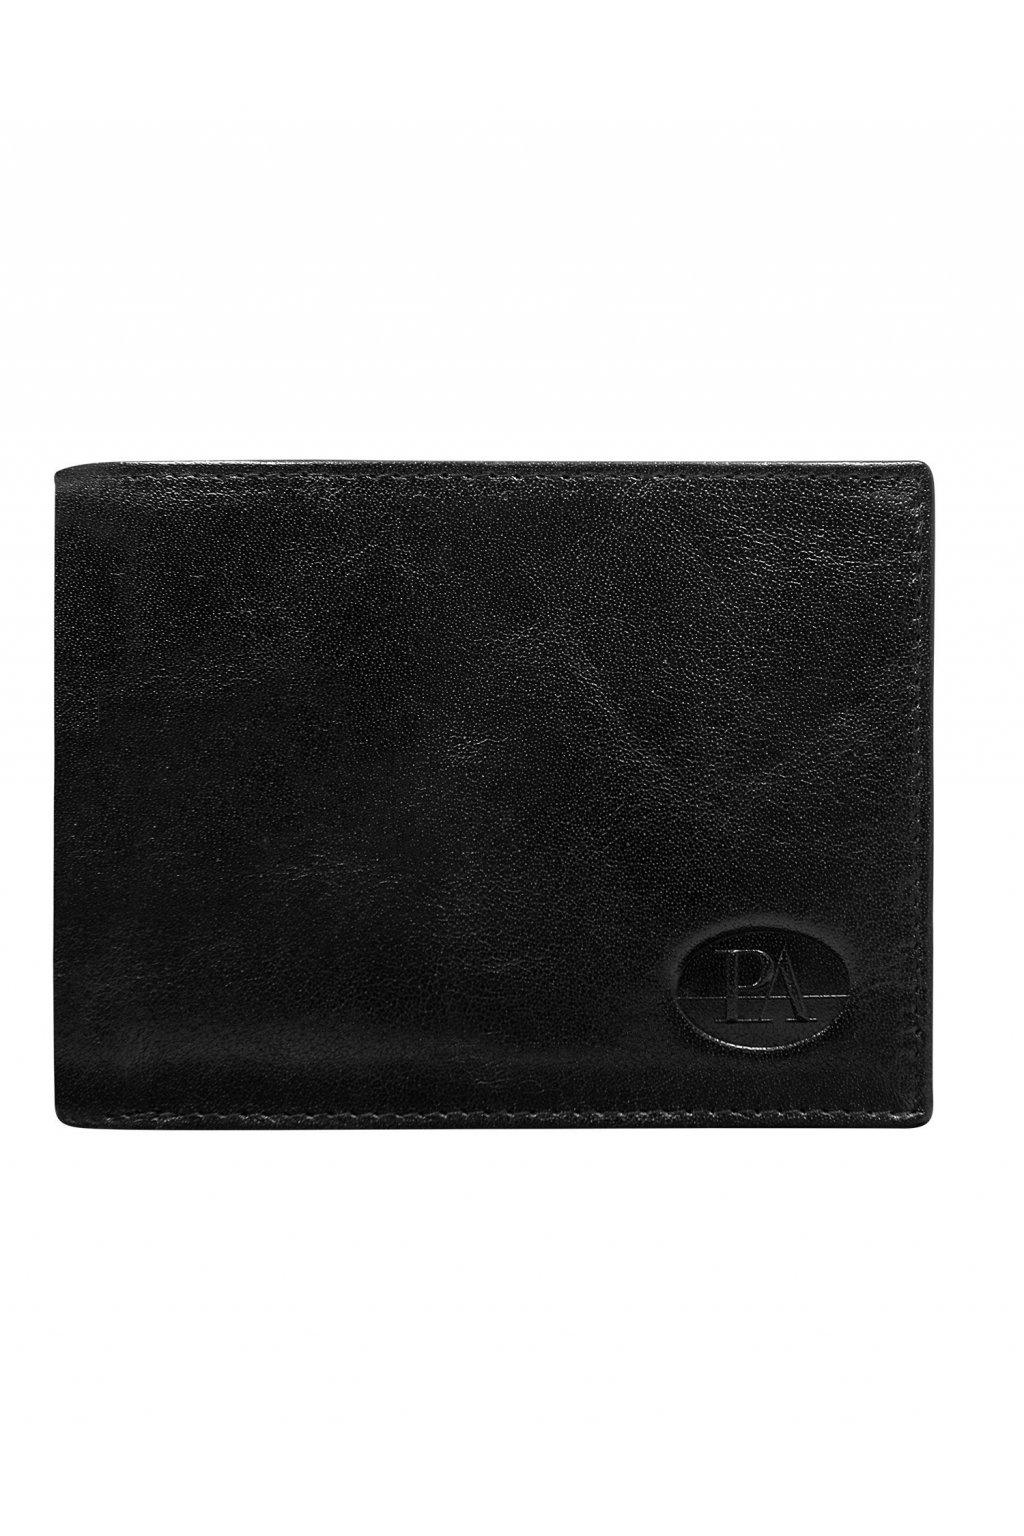 Pánska peňaženka kód CE-PR-PW-008-BTU.34